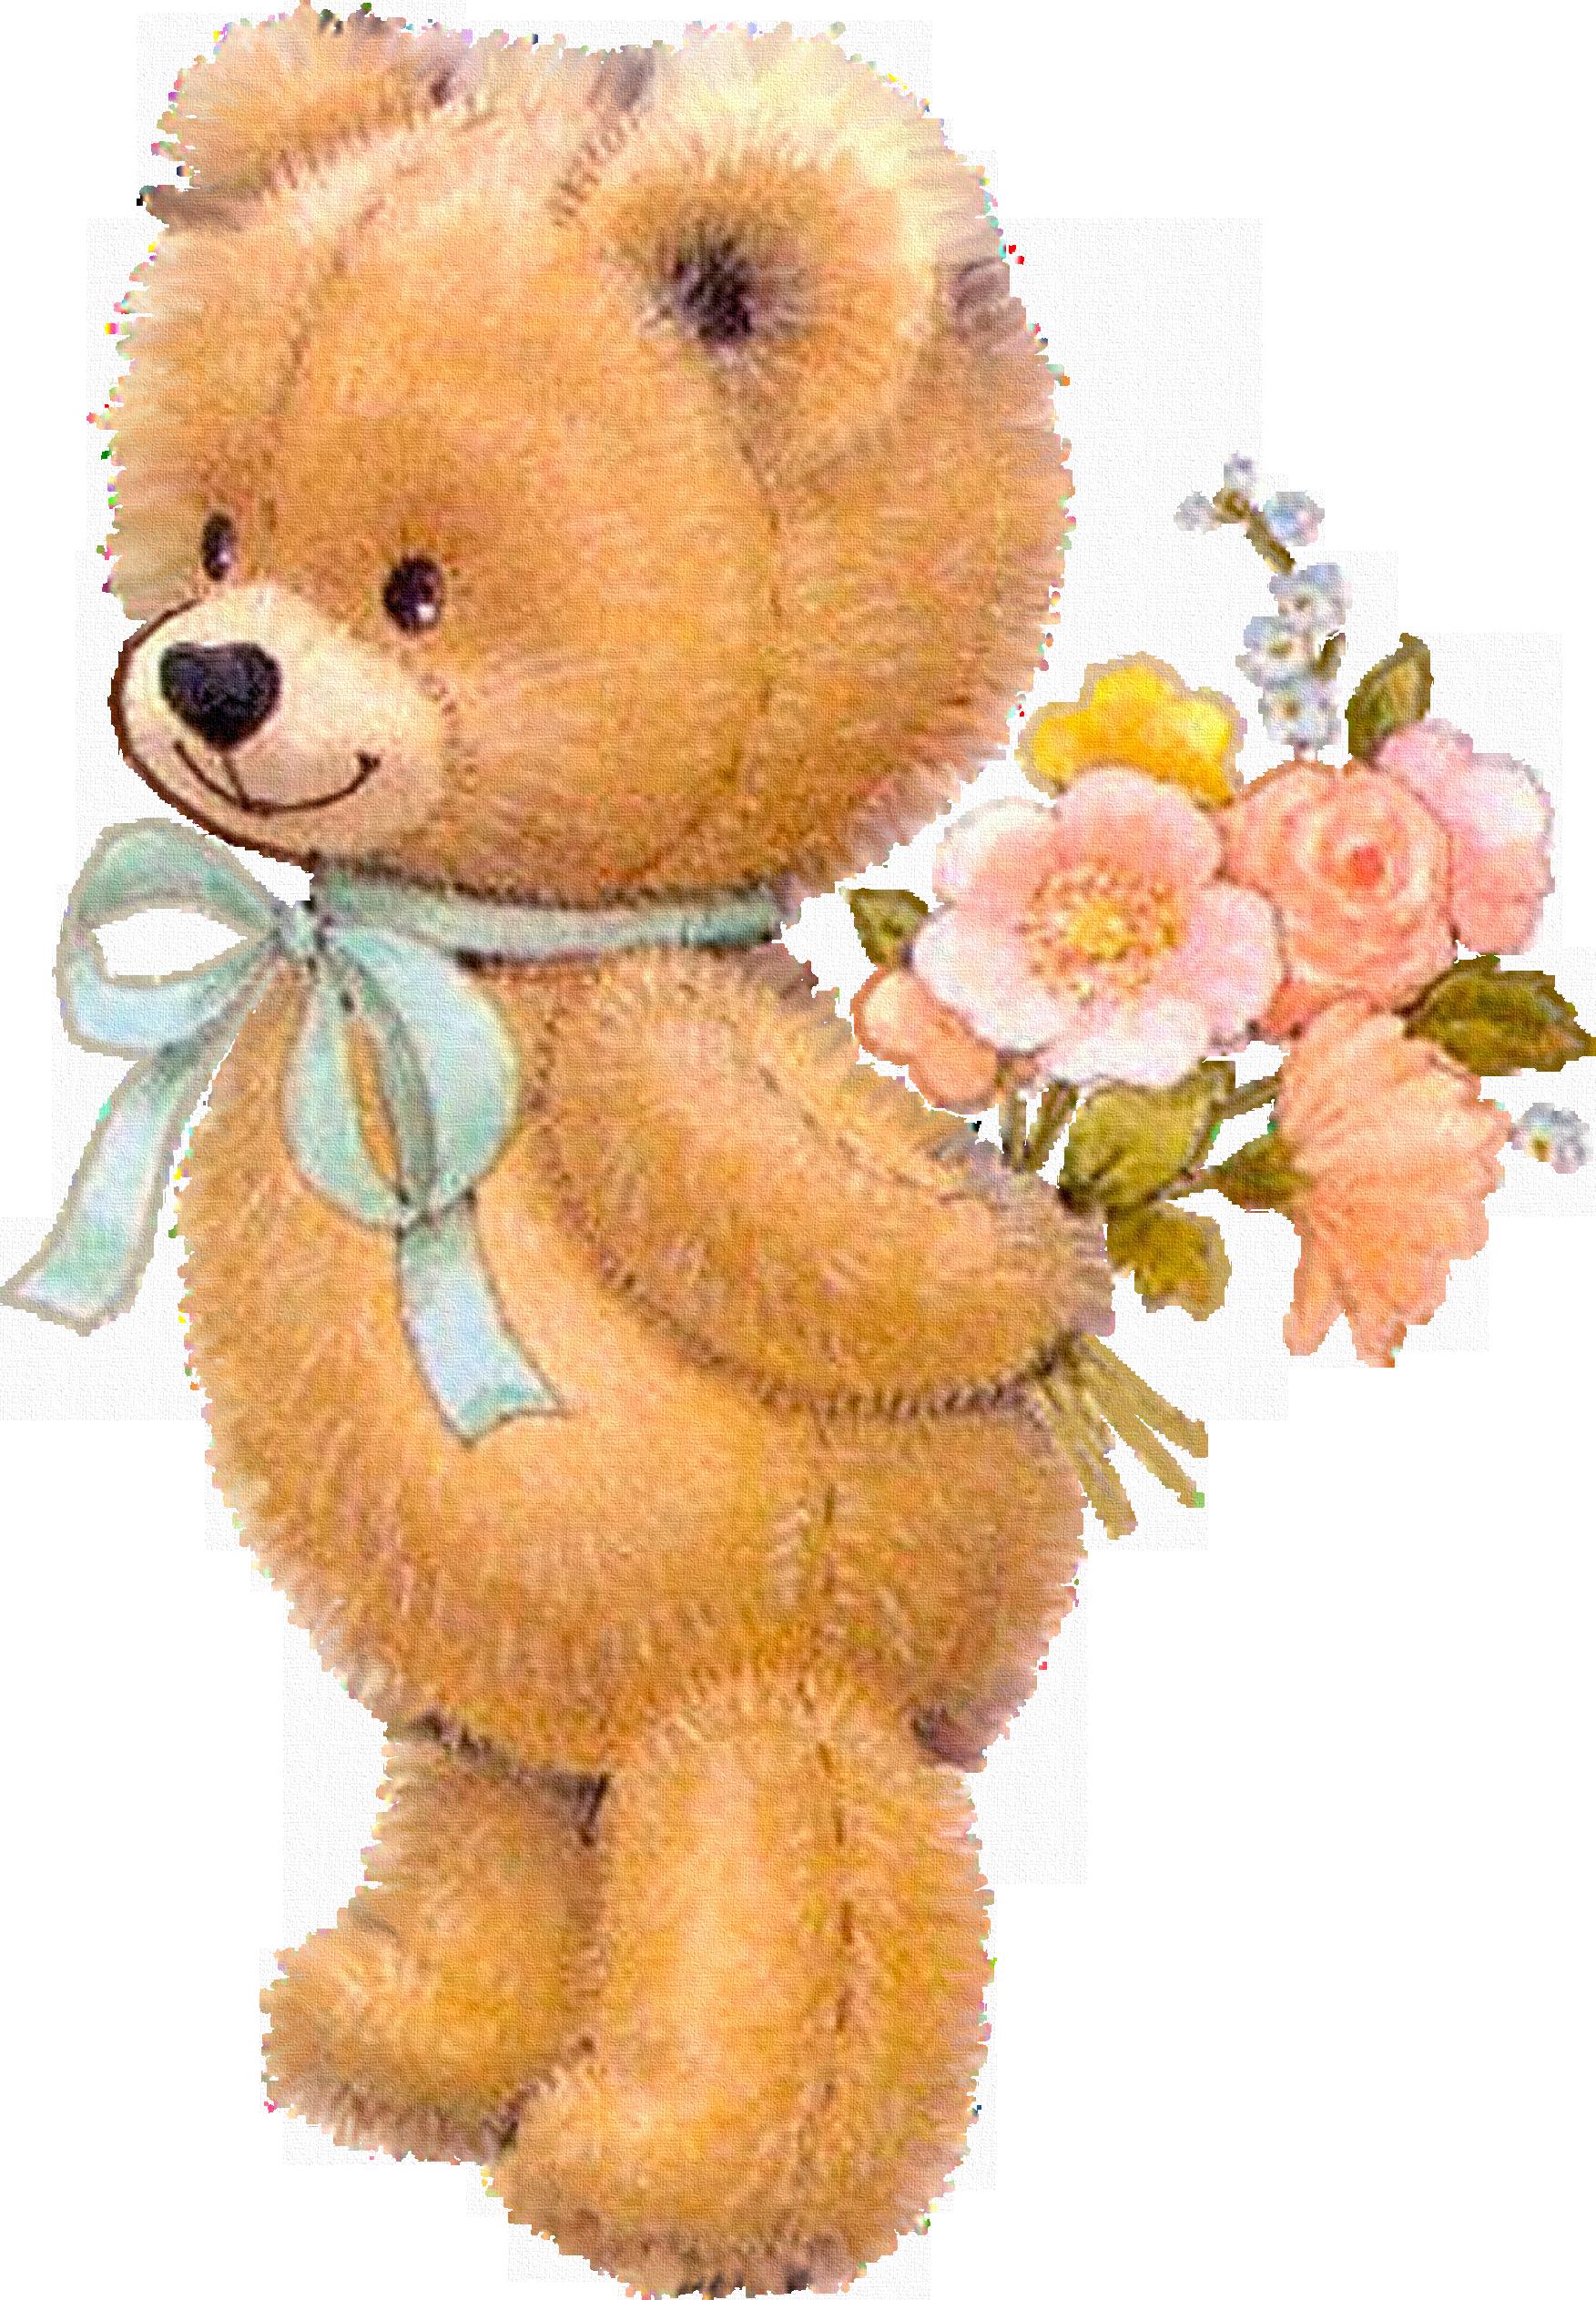 Картинки медведей открытки